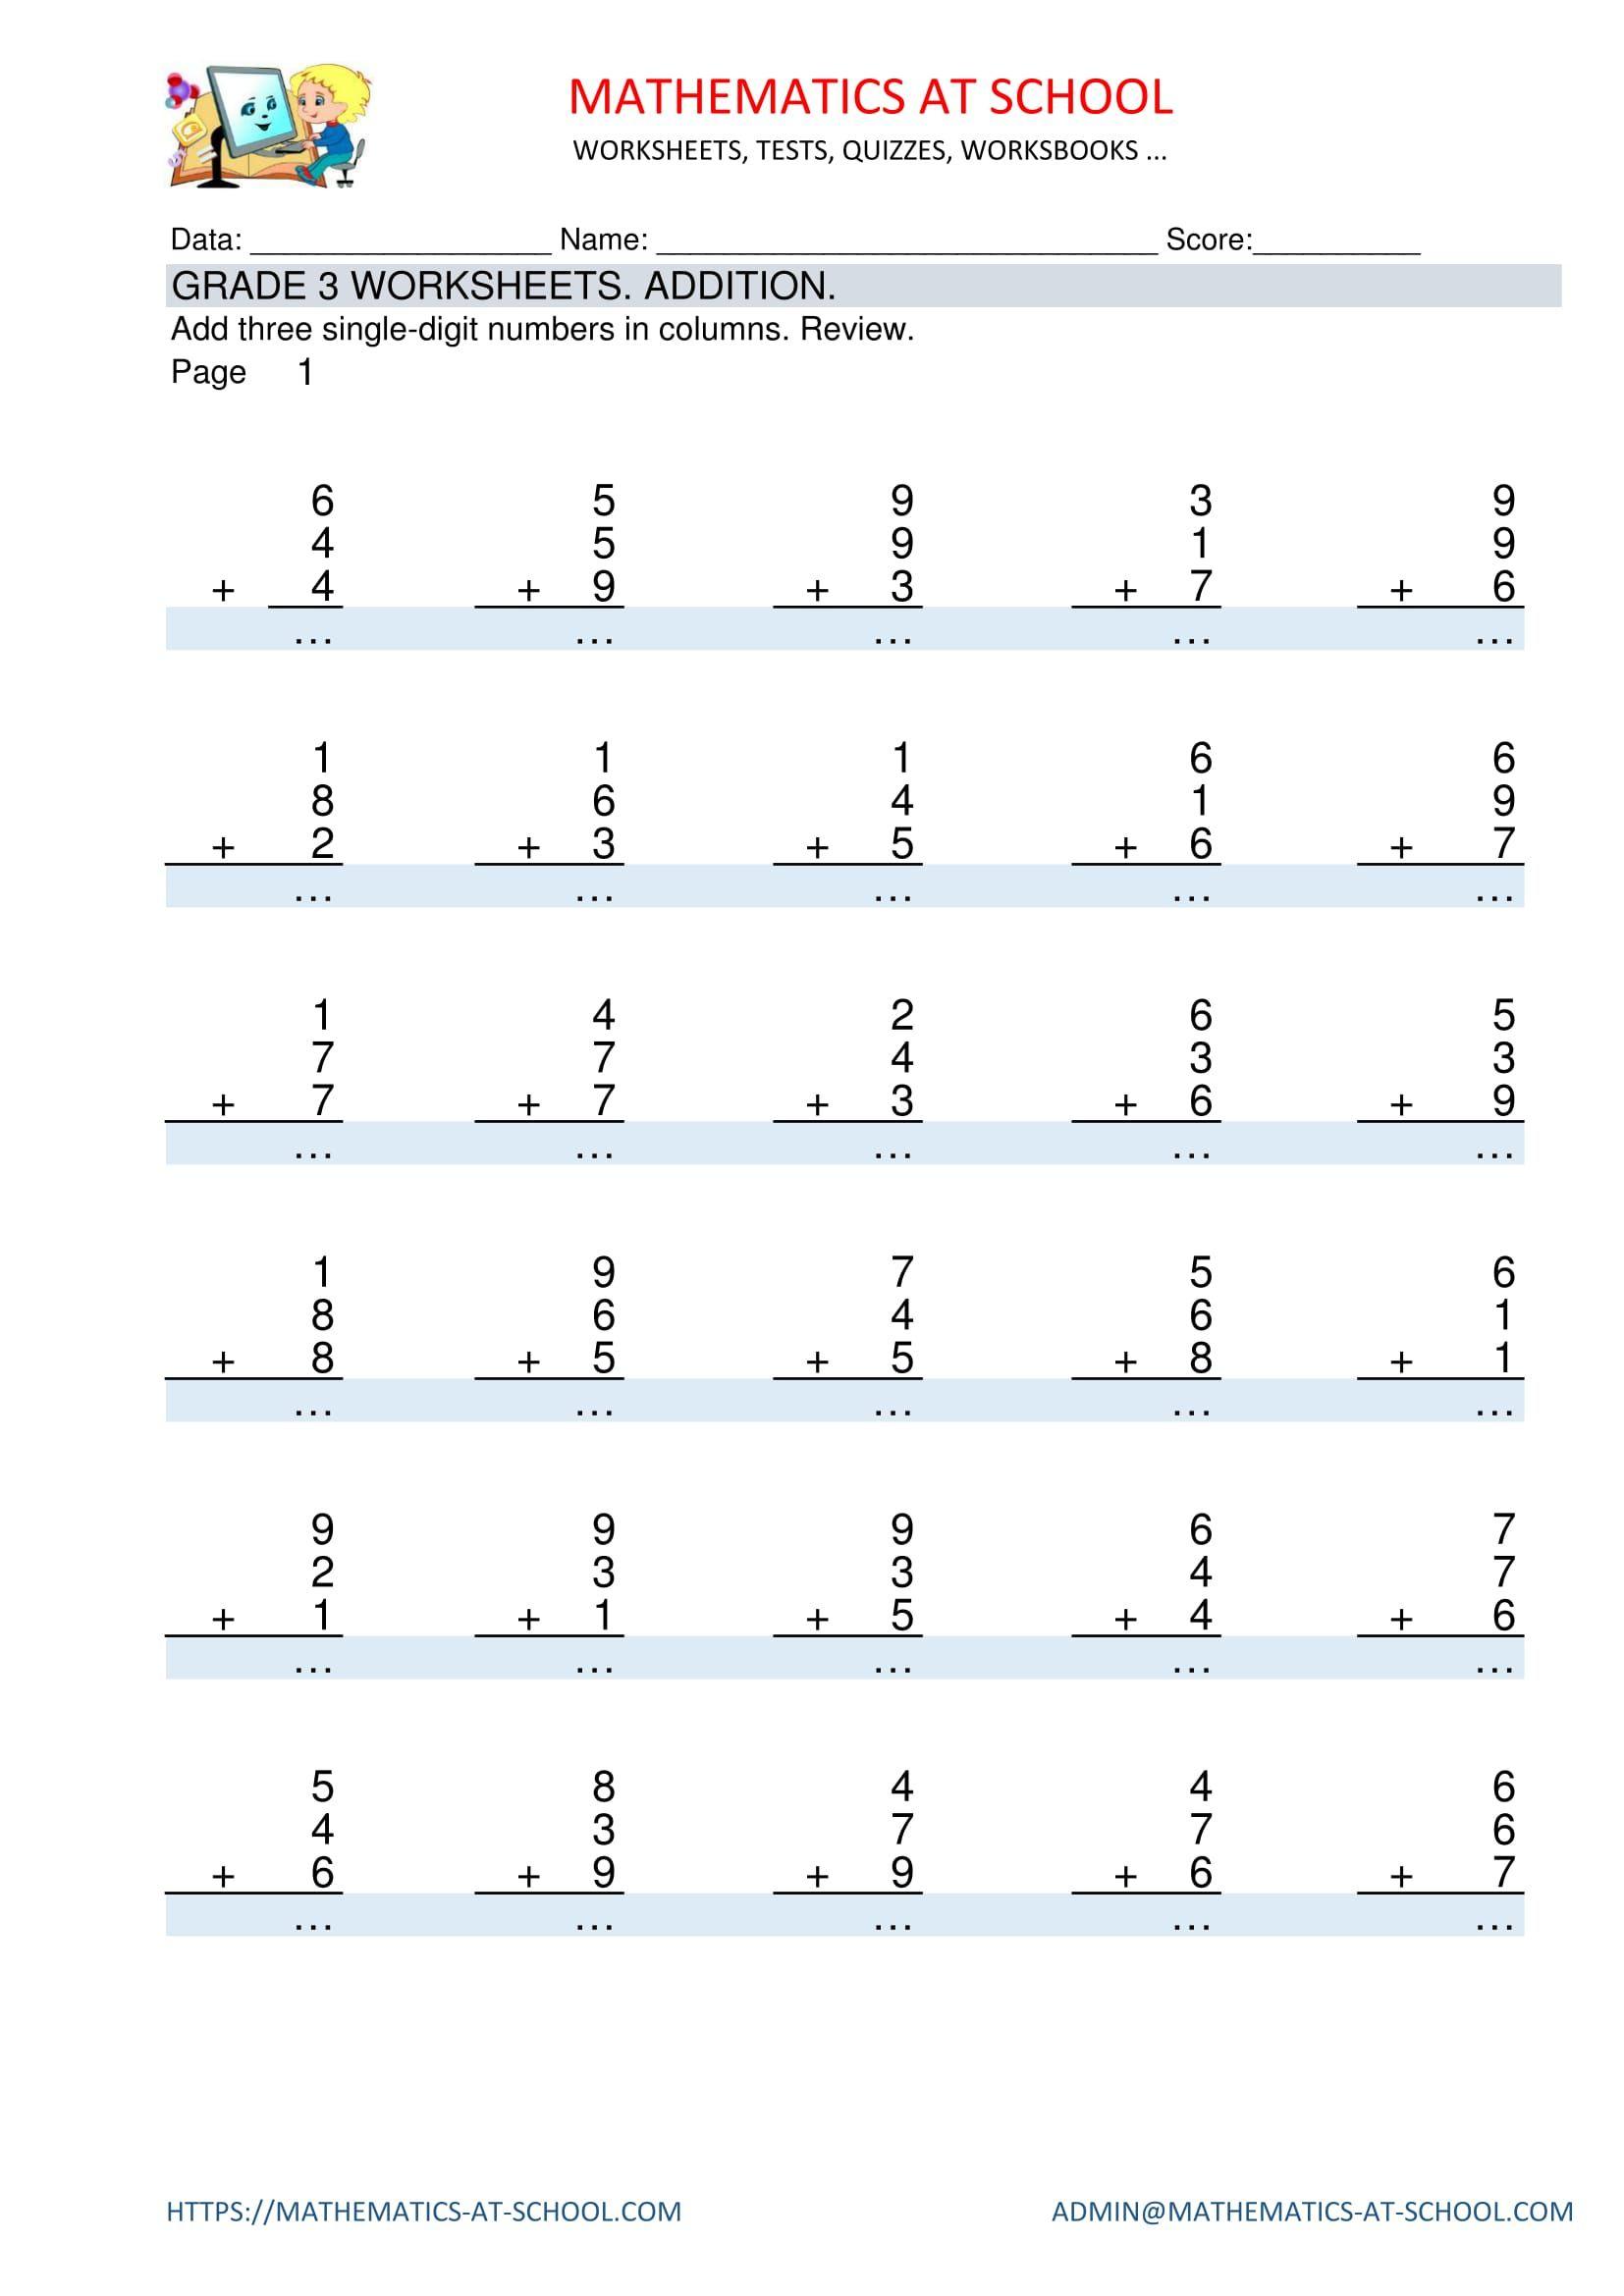 Grade 3 Maths Worksheets: Addition Adding Three 1-Digit for Printable Multiplication Sheets For Grade 3